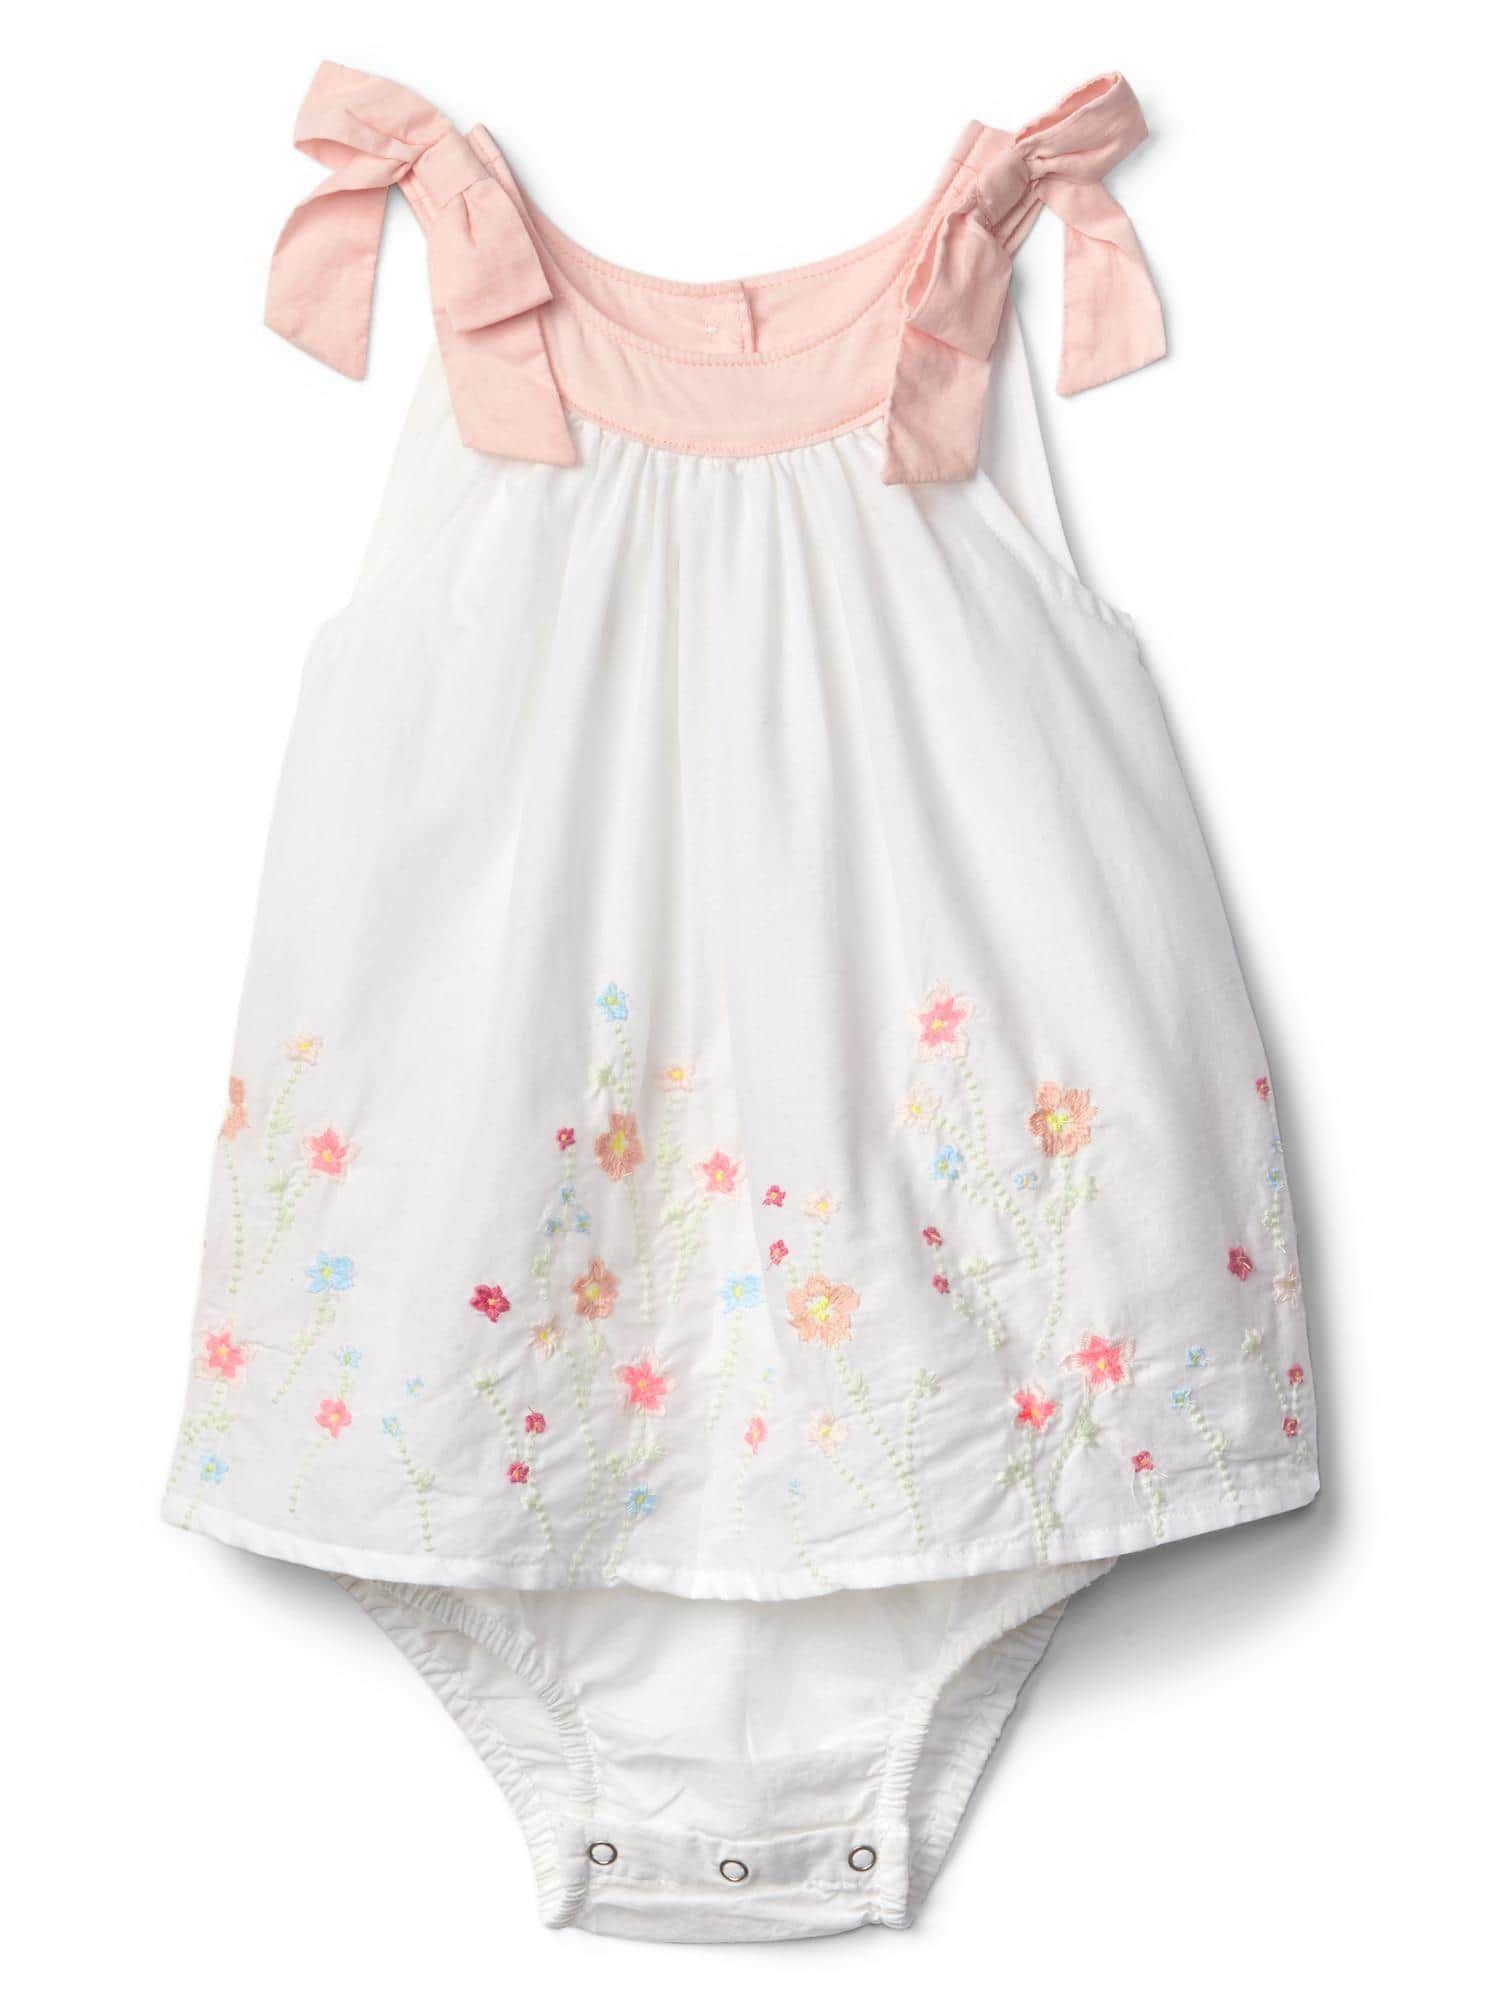 Embroidered Floral Border Gap Baby Portfolio